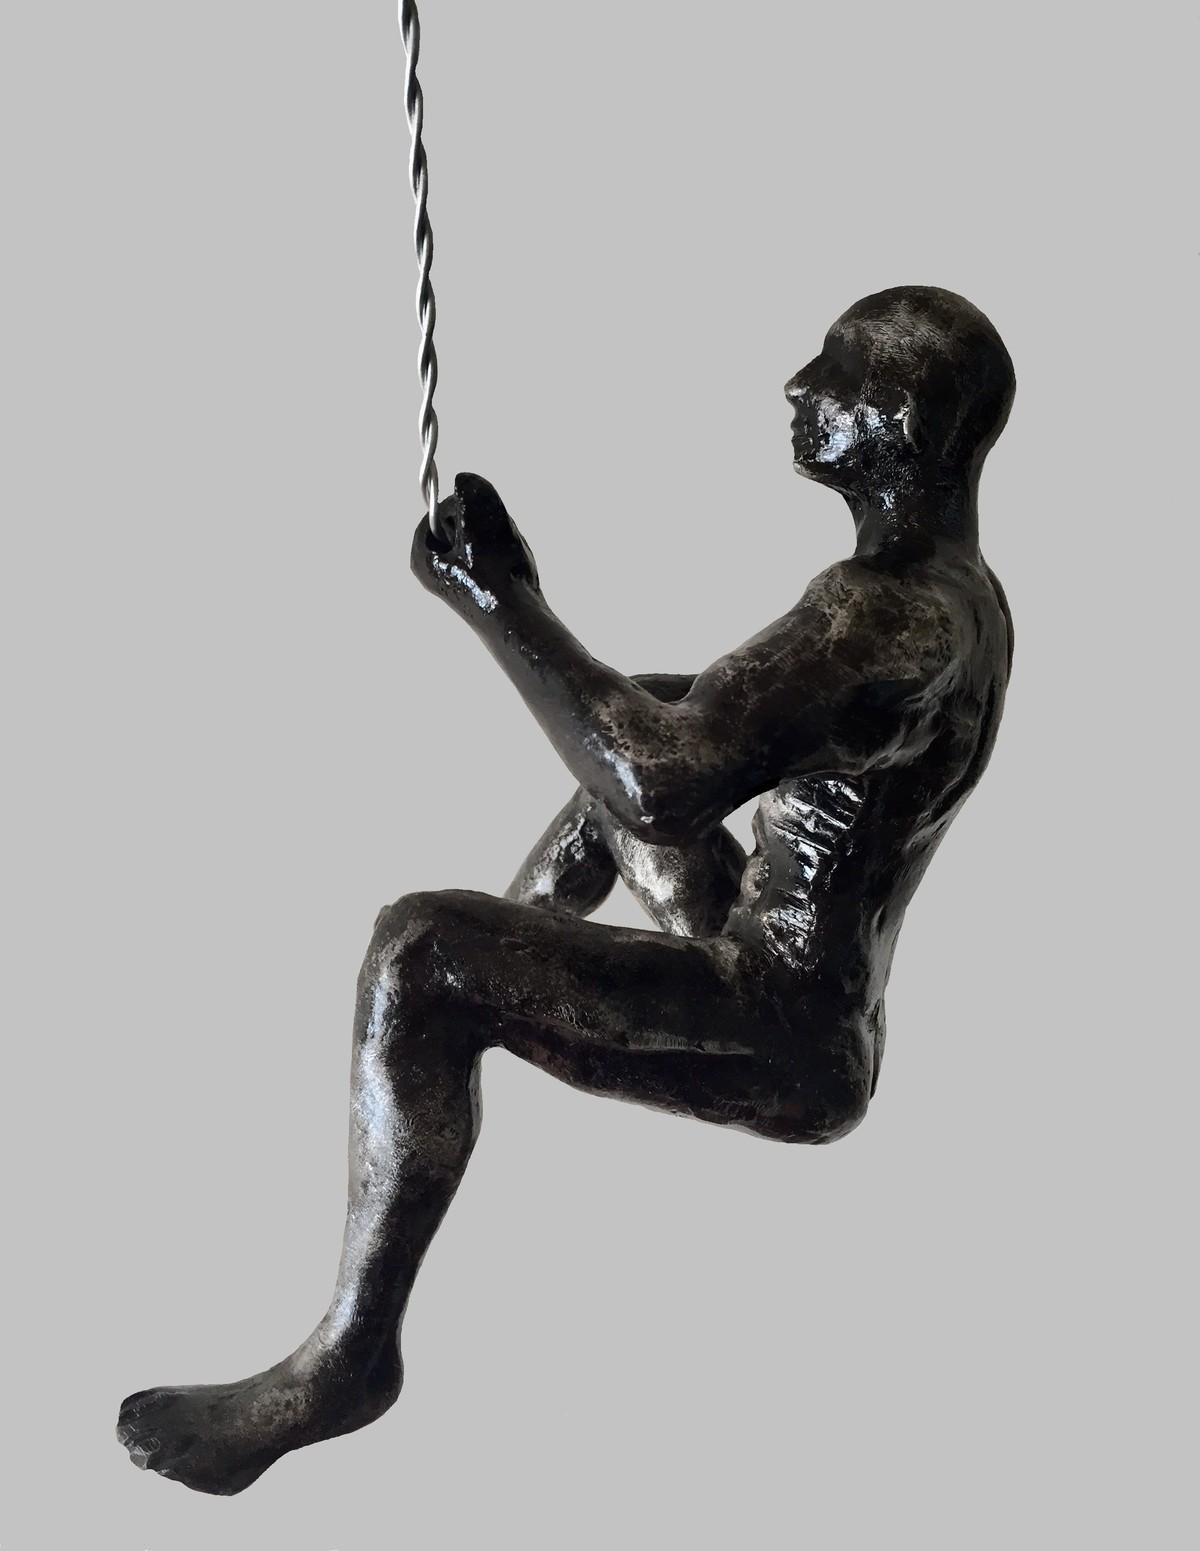 The Climber by Vernika, Art Deco Sculpture   3D, Metal, Gray color